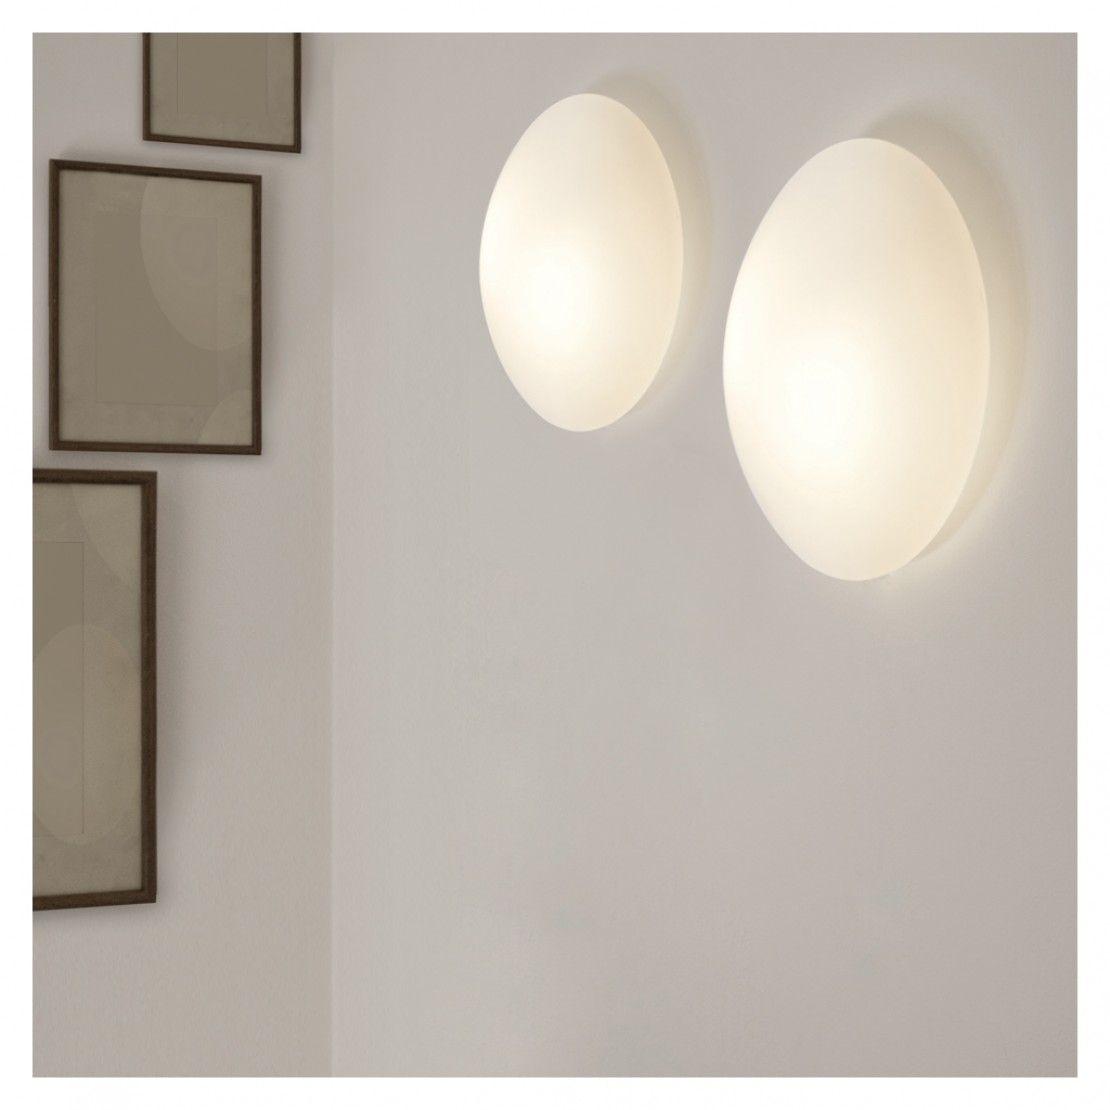 Jesolo Lamp Large Living room lighting, Wall lights